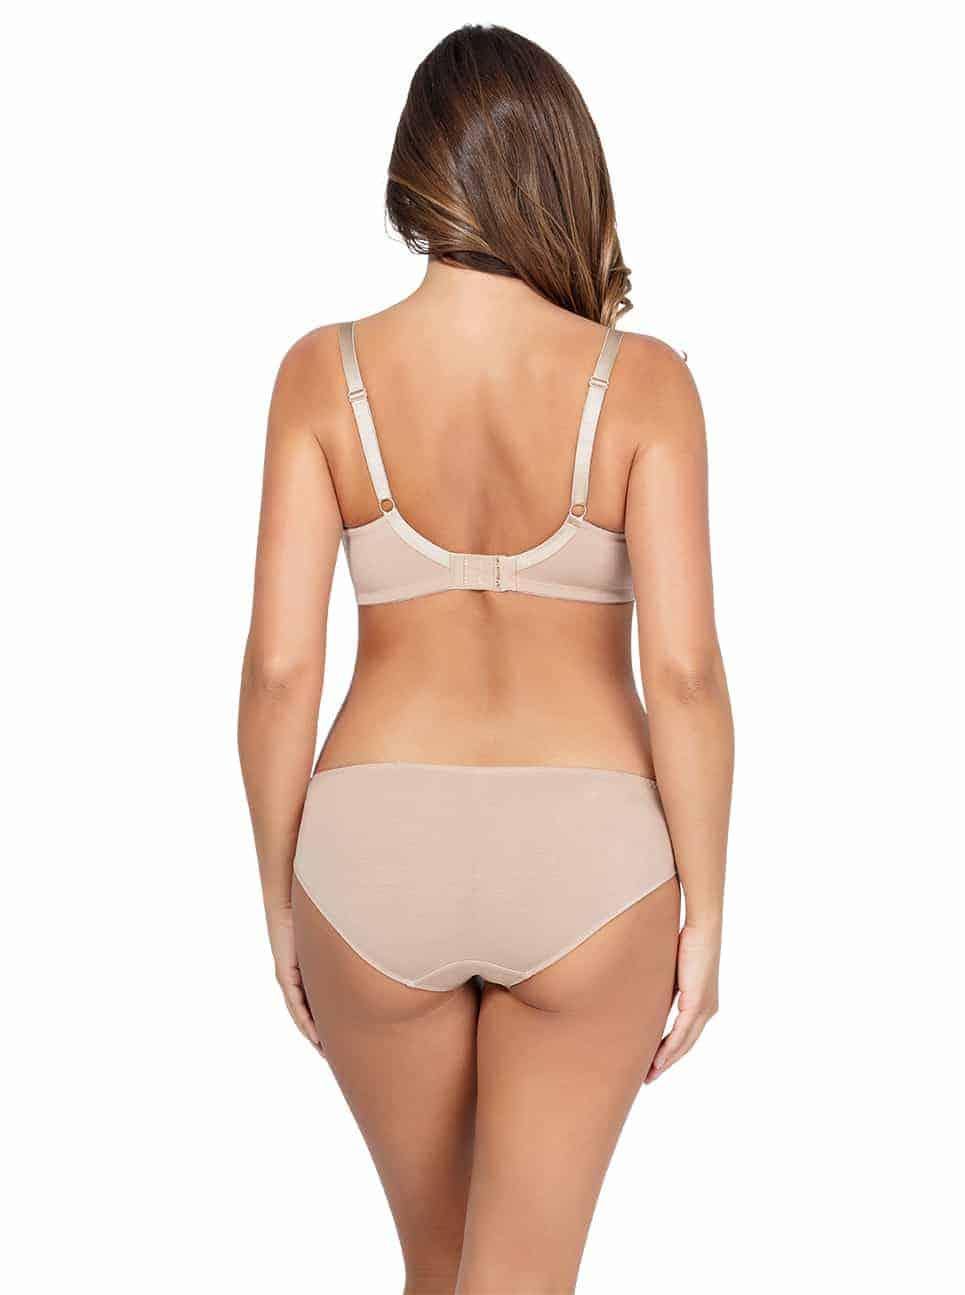 Tess UnlinedWireBraP5022 BikiniBare - Tess Unlined Wire Bra - Bare - P5022